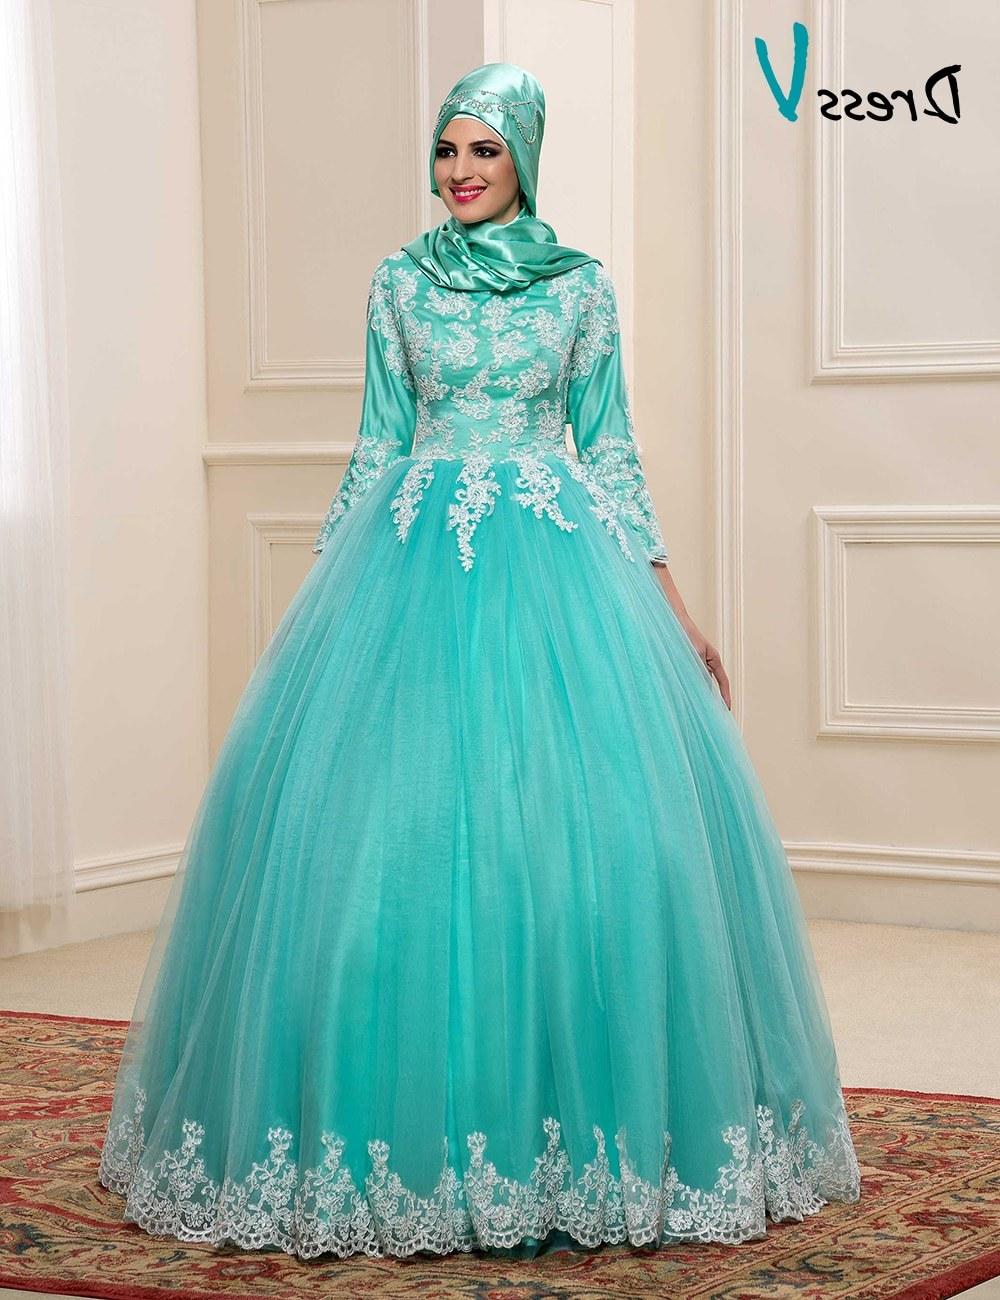 Bentuk Model Baju Pengantin Muslim Modern Whdr islamic Hijab Wedding Dresses – Fashion Dresses